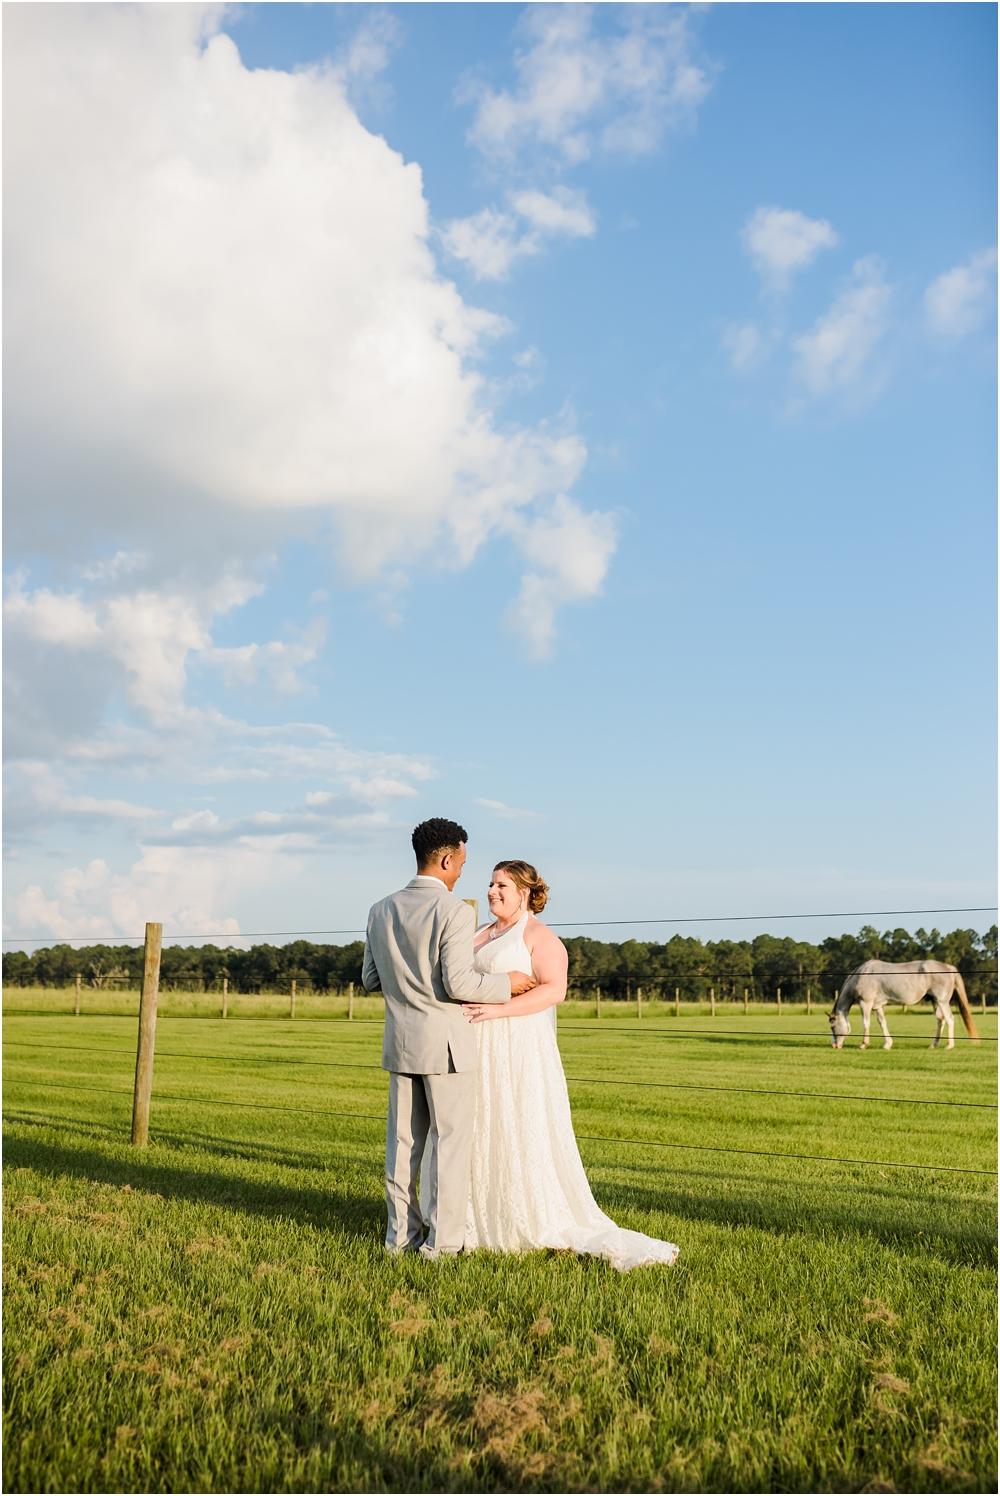 mosley-wedding-kiersten-stevenson-photography-30a-panama-city-beach-dothan-tallahassee-(212-of-472).JPG